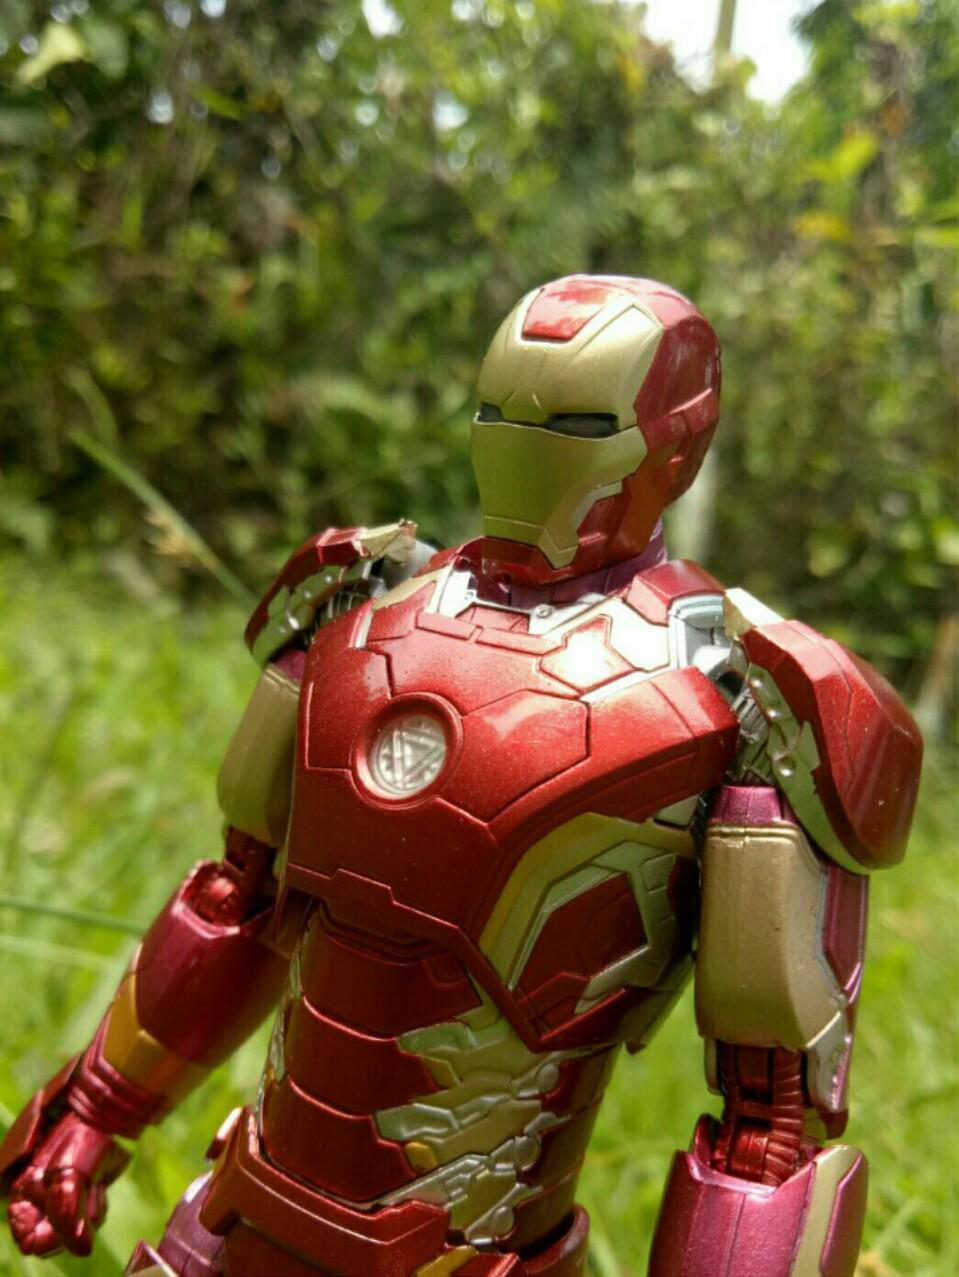 BANDAI SH FIGUARTS Ironman Mark 43(age of ultron)